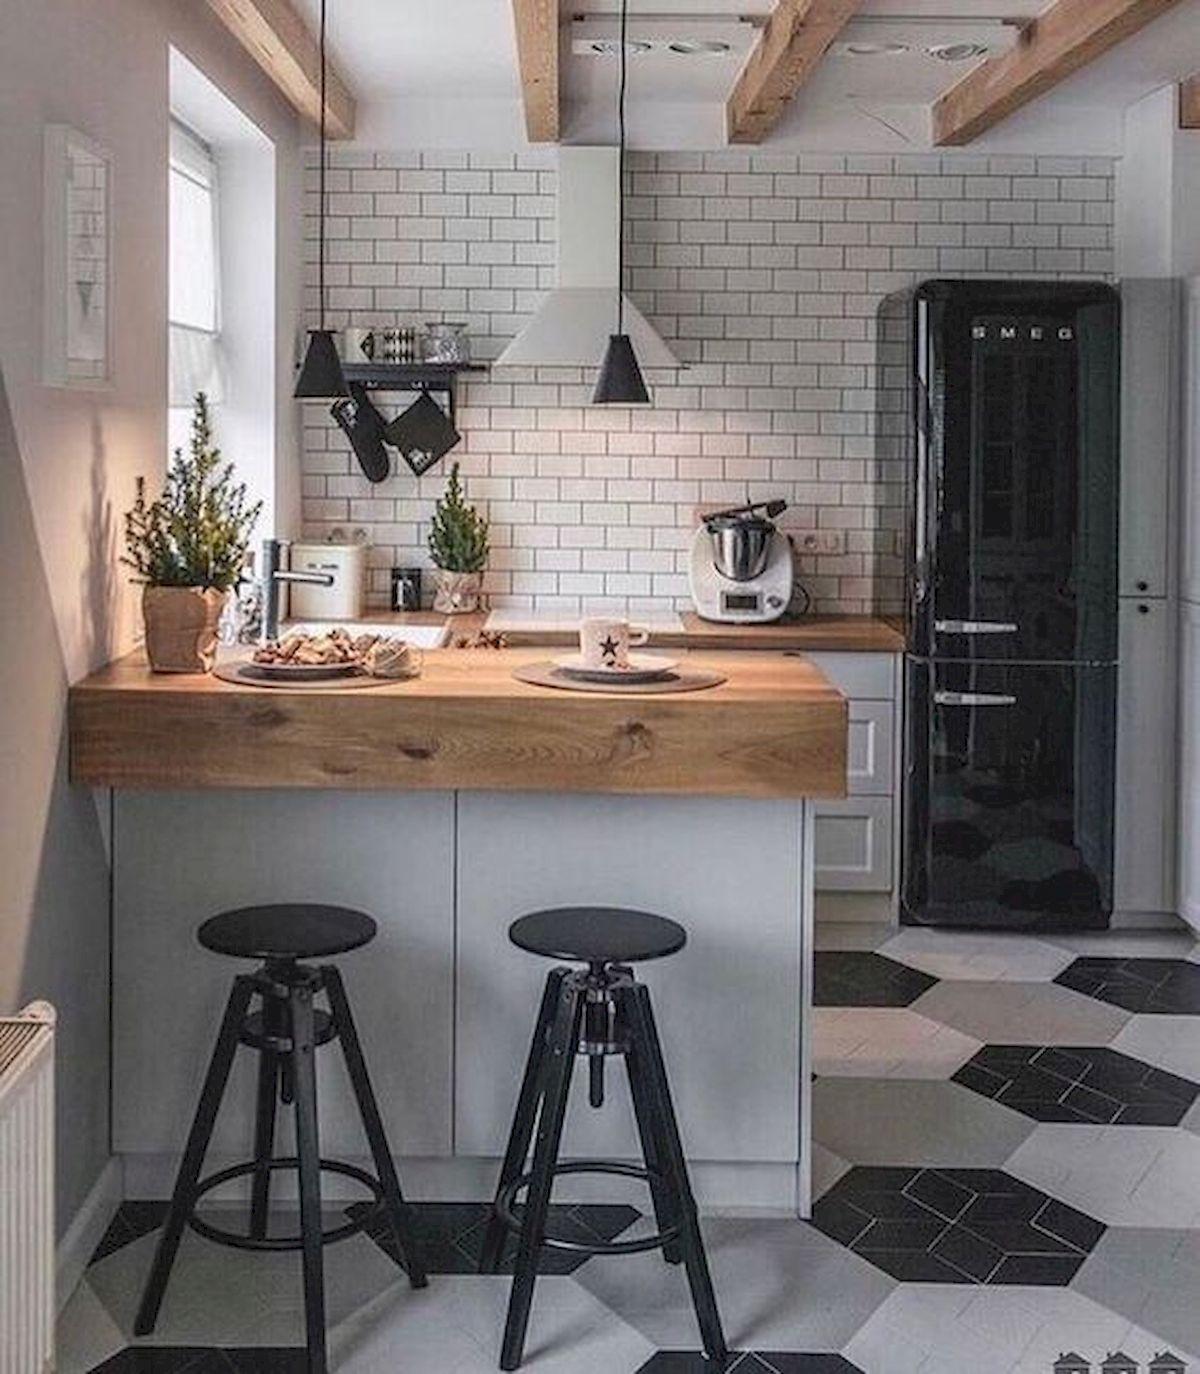 Gorgeous 90 Beautiful Small Kitchen Design Ideas Source Https Ideaboz Com 2019 01 18 90 Beaut Kitchen Remodel Small Kitchen Design Small Home Decor Kitchen